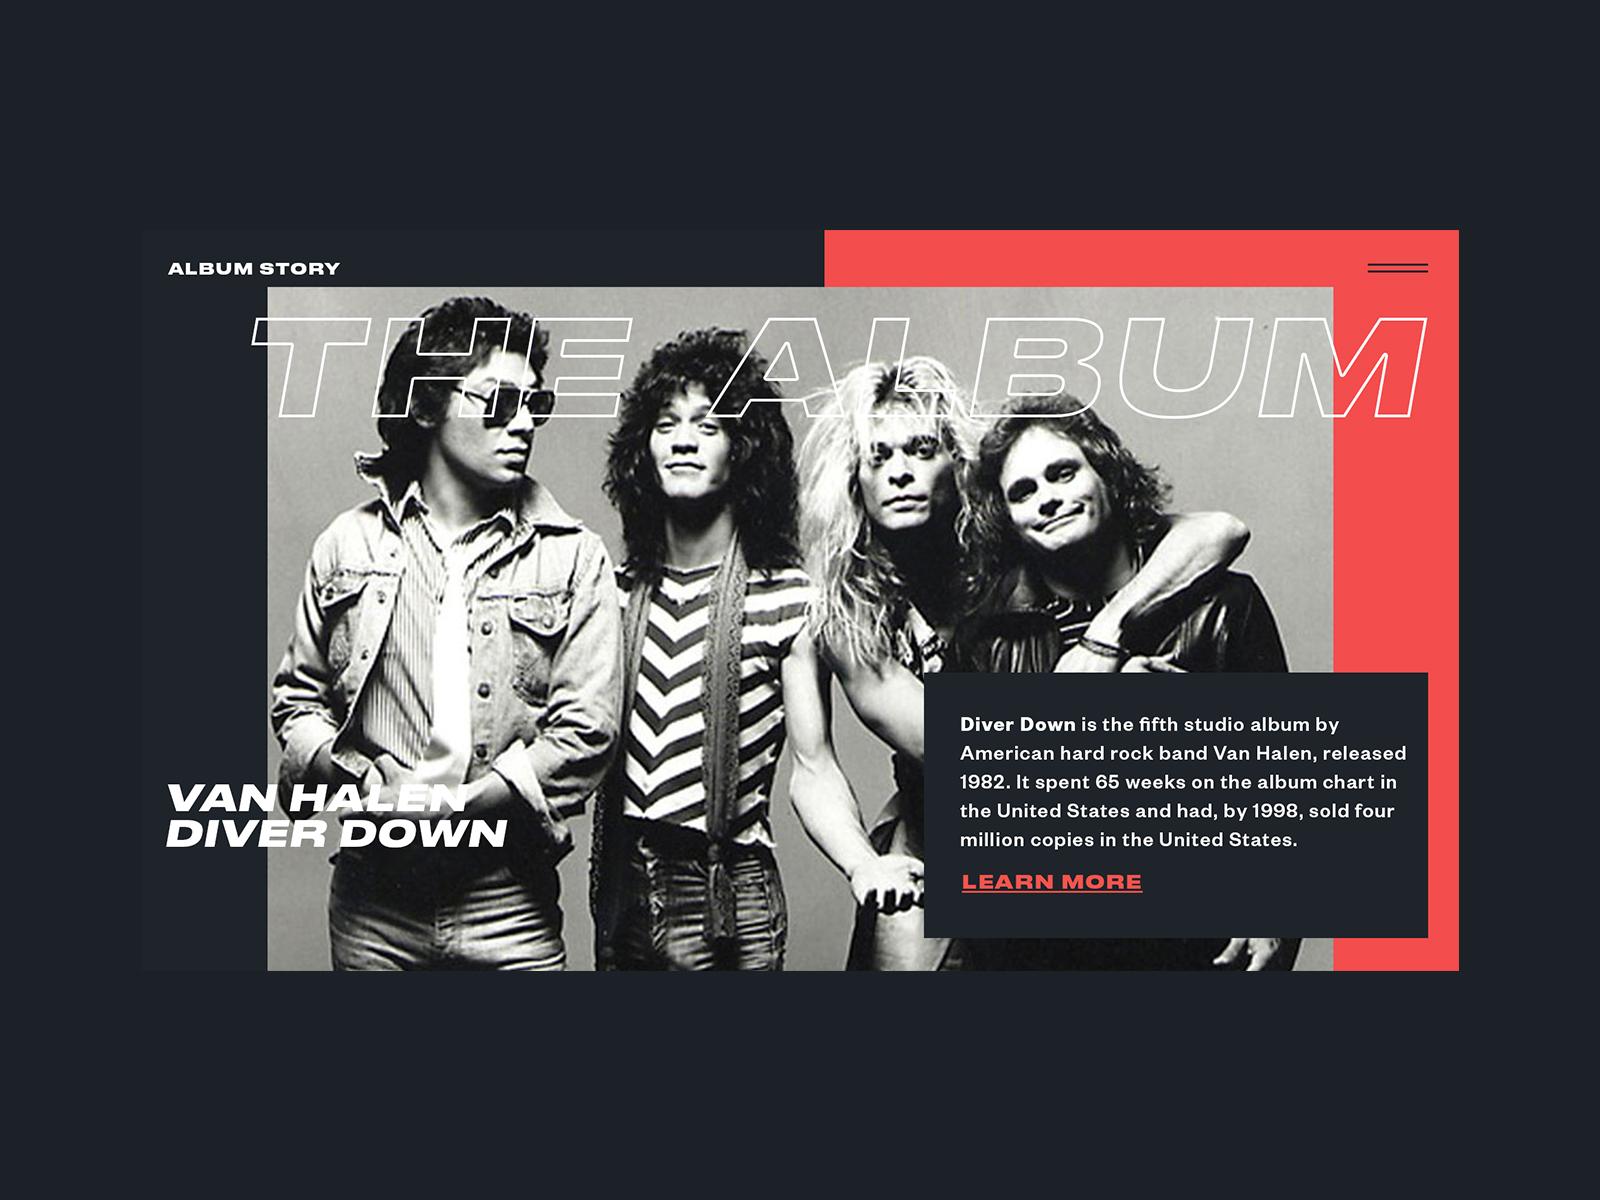 Van Halen Diver Down By Jakob Sermwiset Persson Design Inspiration